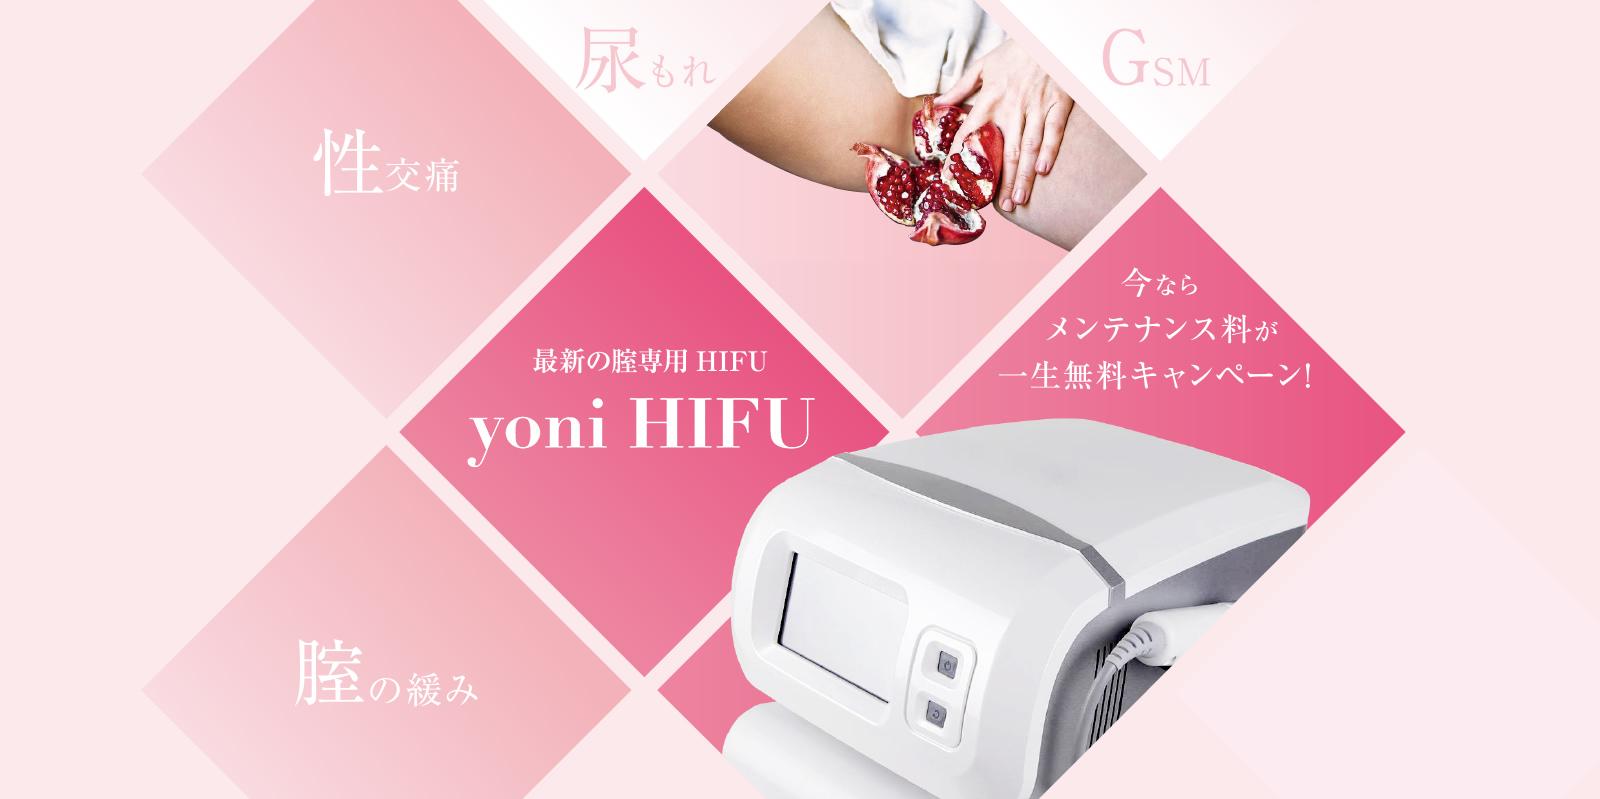 yoniHIFU(ヨニハイフ)